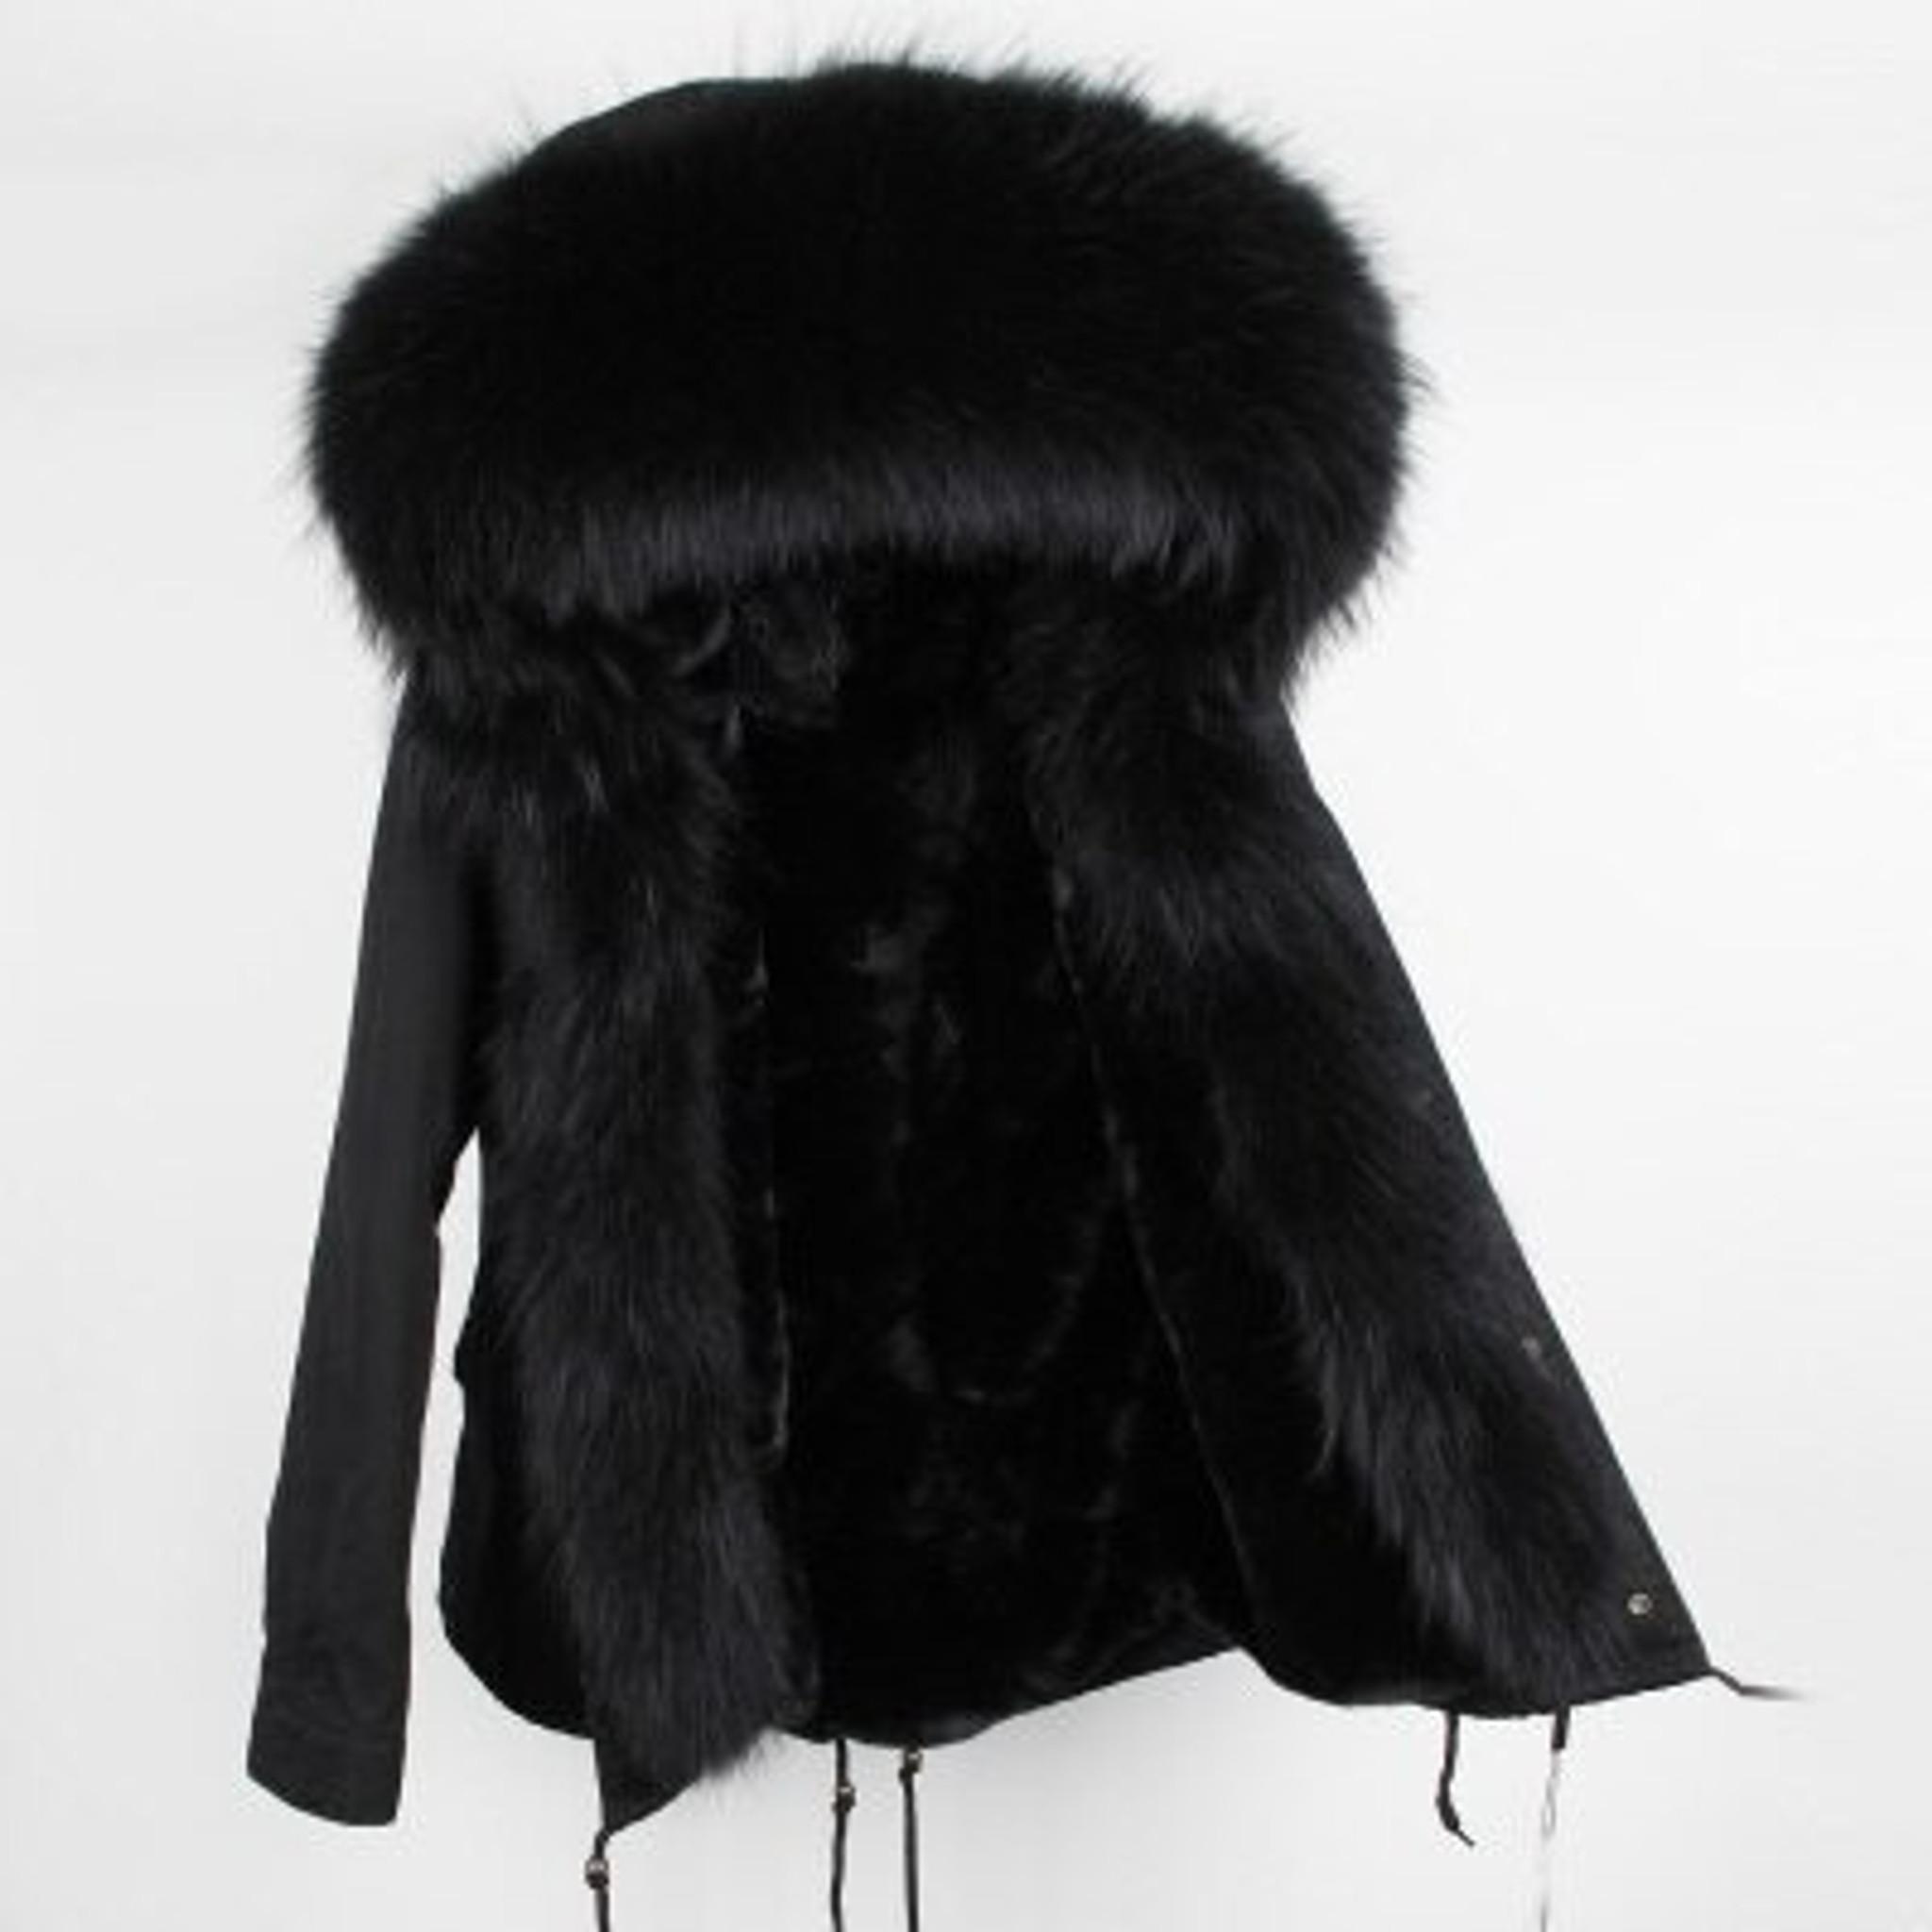 Fur Coat - Multi colors